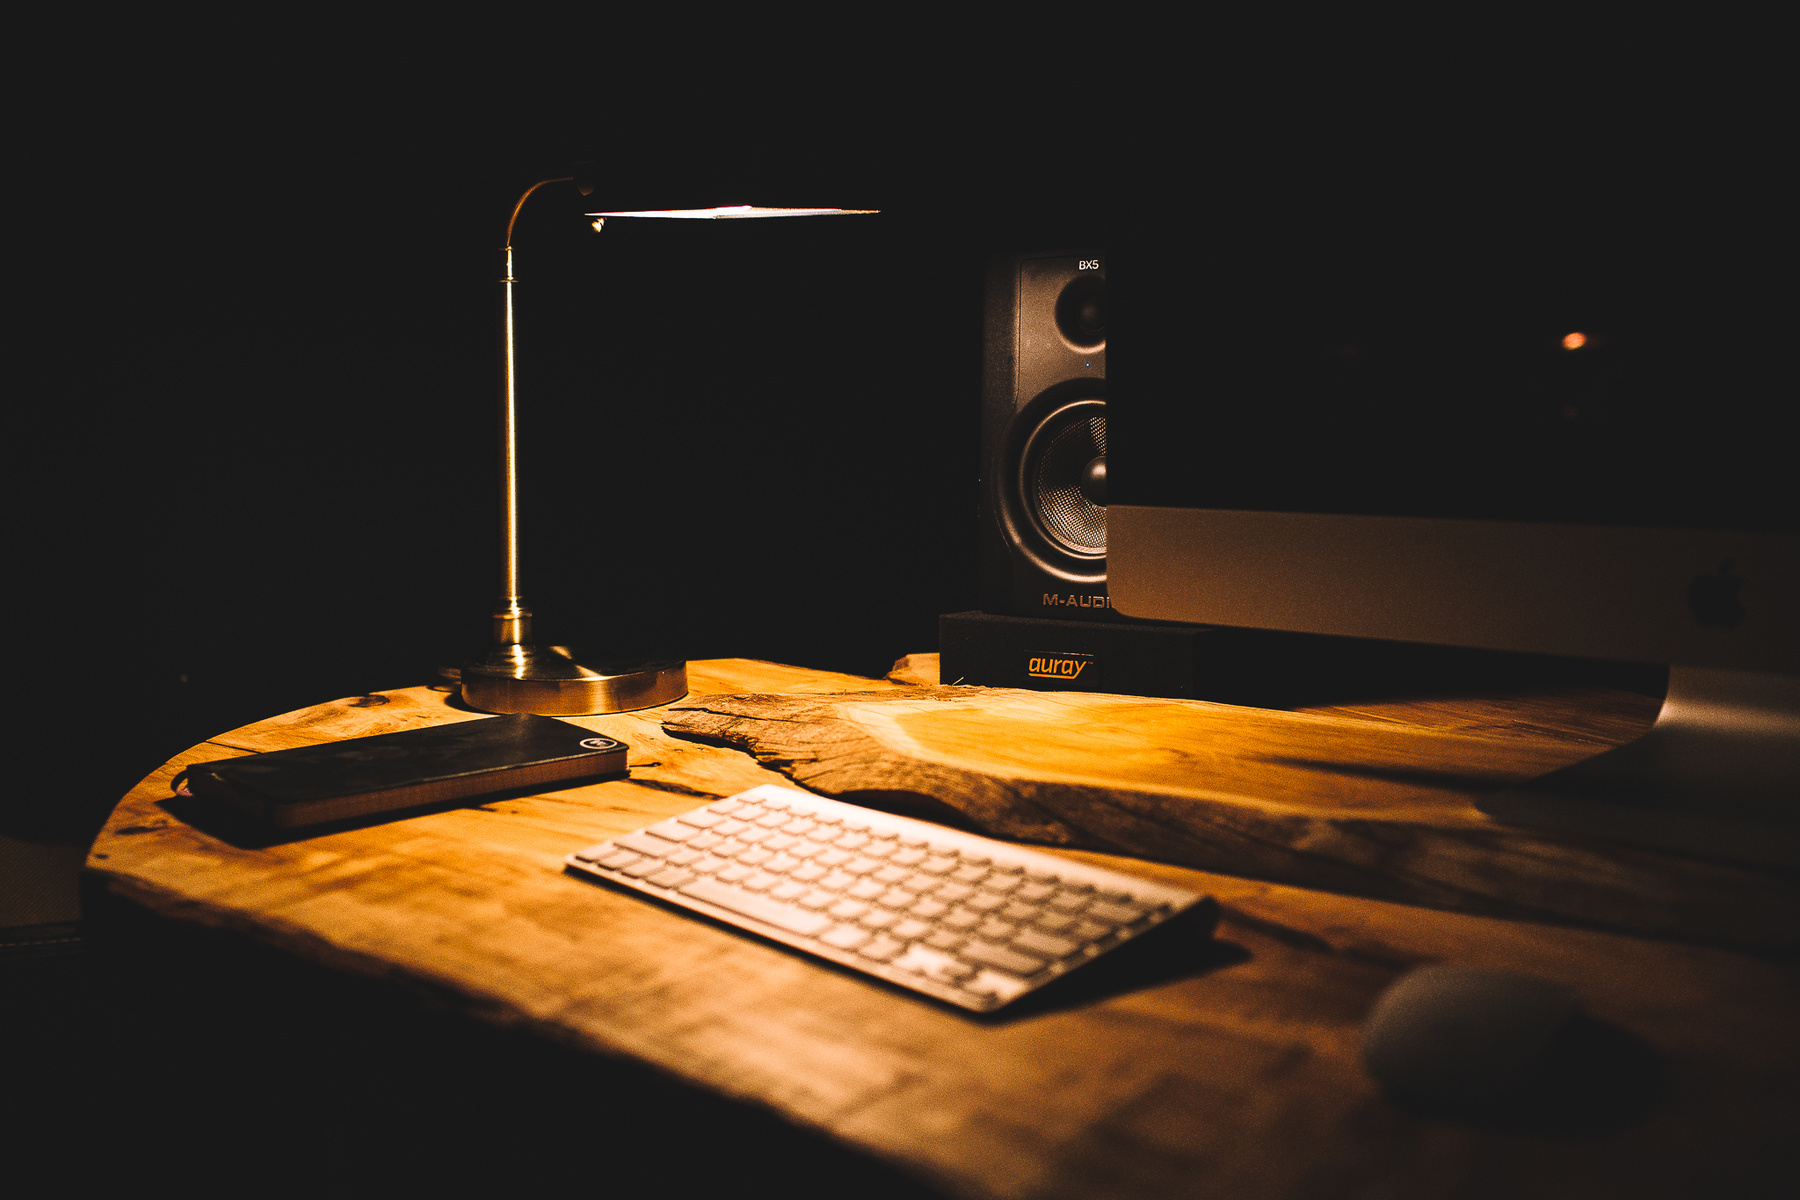 neosonic-productions-studio.jpg